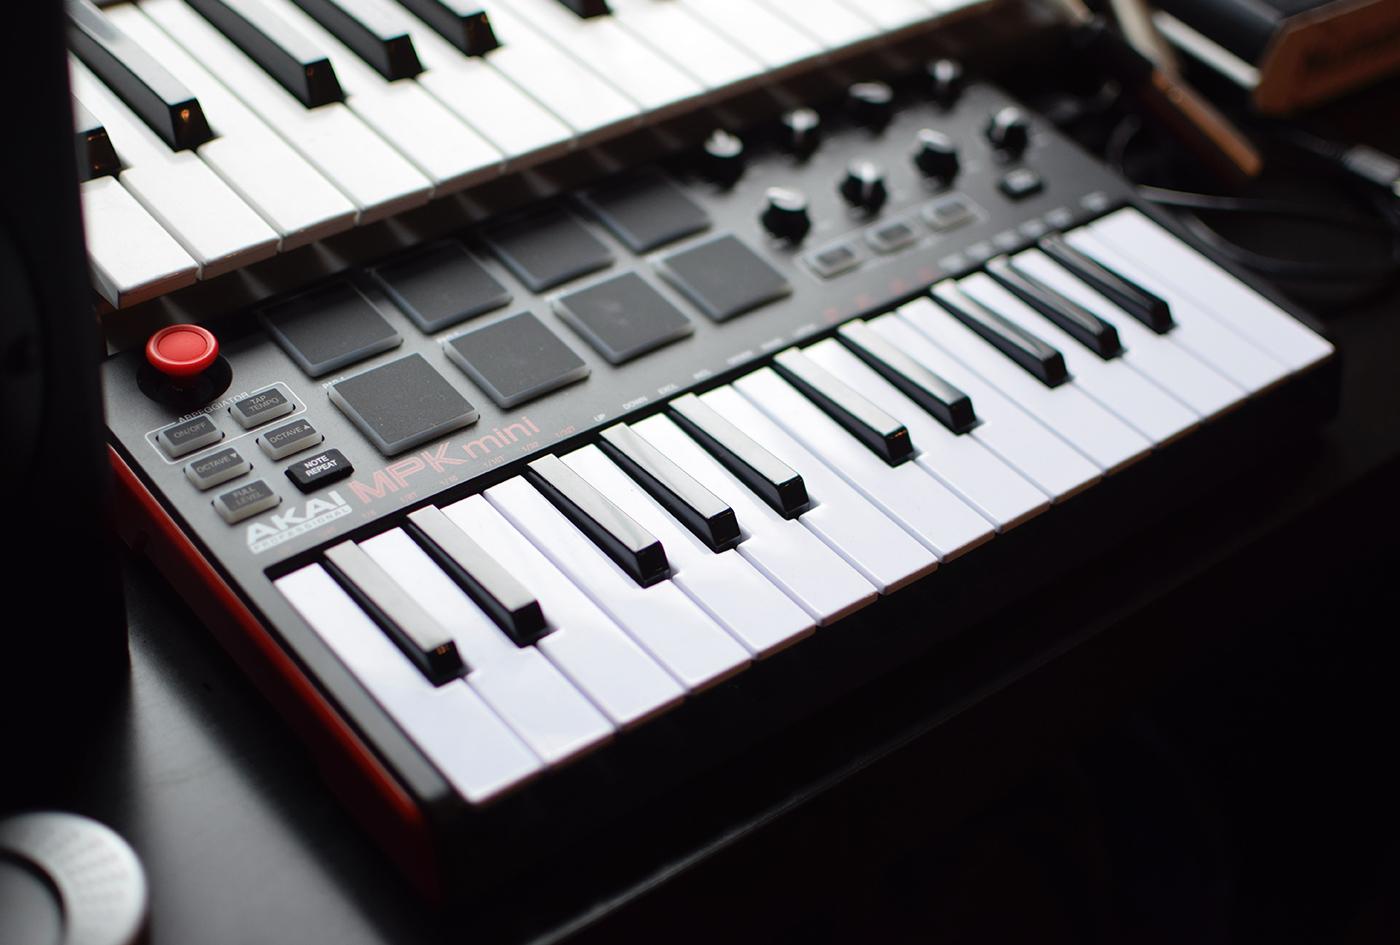 MIDIの基礎知識①:ノート入力の基礎